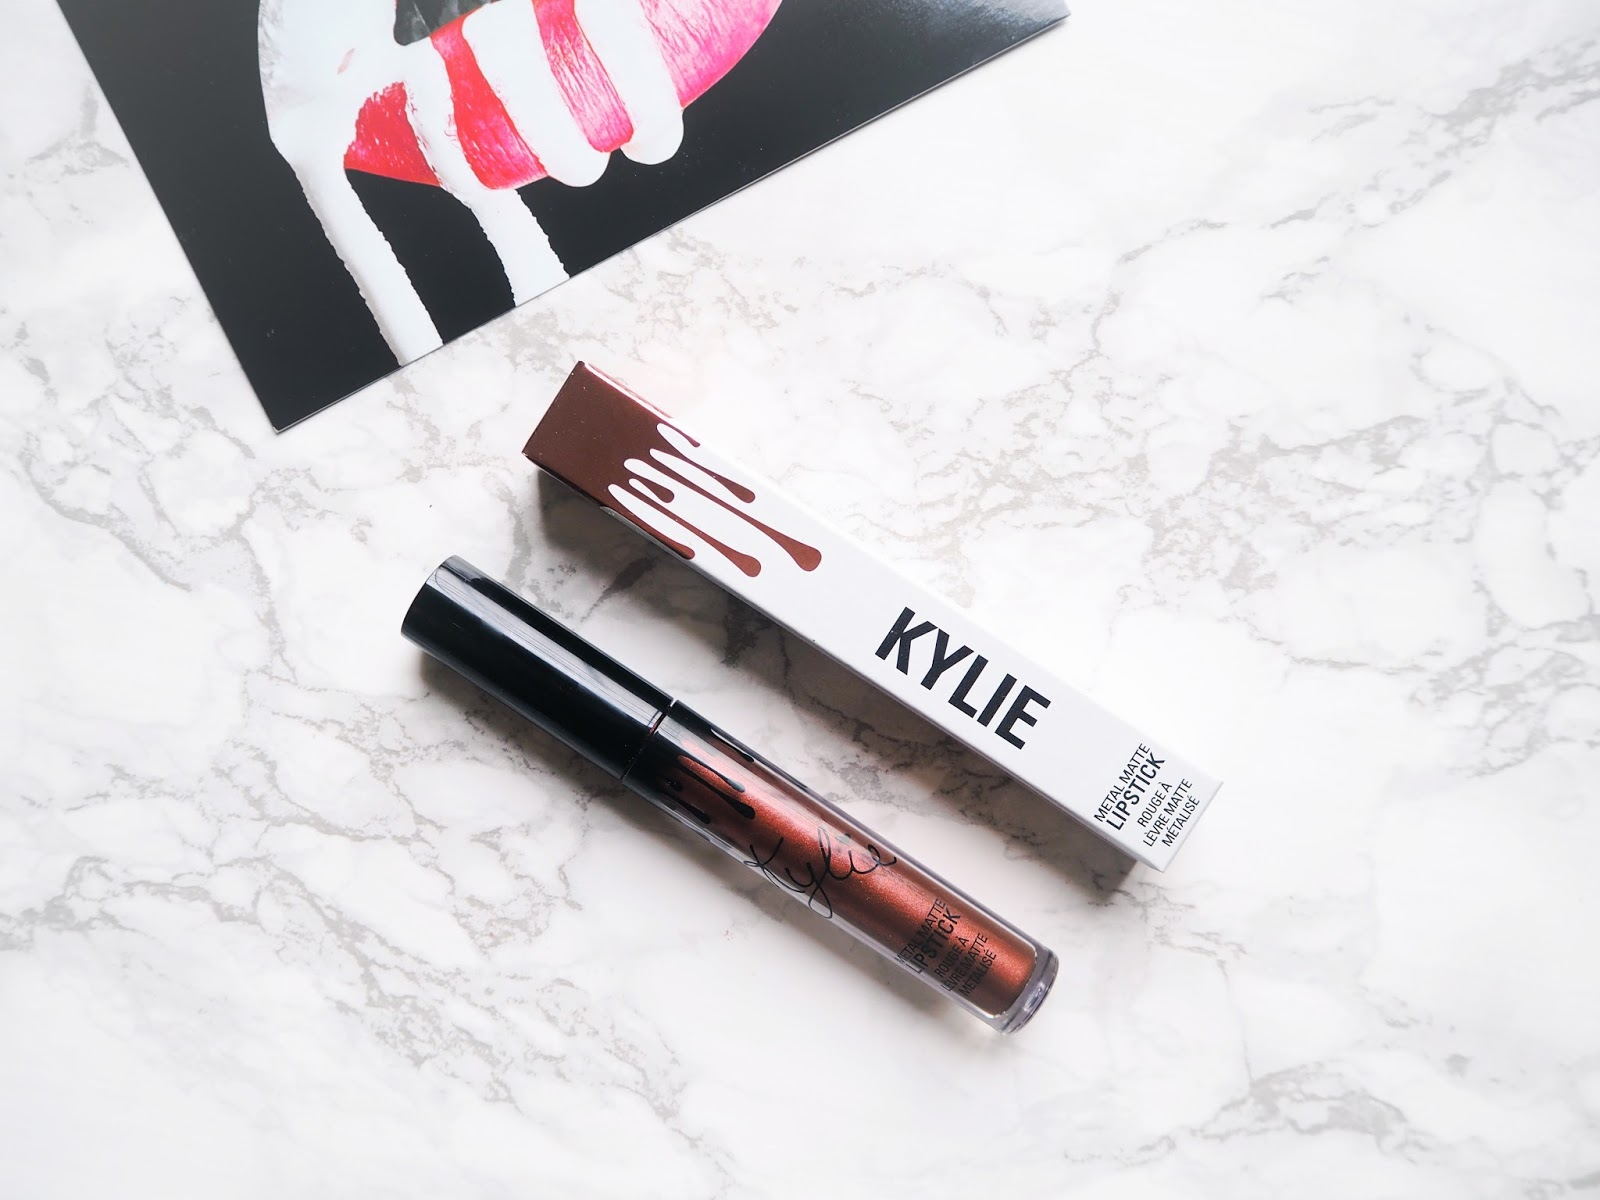 Kylie Cosmetics Metal Matte Lipstick | Review & Swatches, kylie jenner lip kit, metal matte liquid lipstick, reign, review, swatches